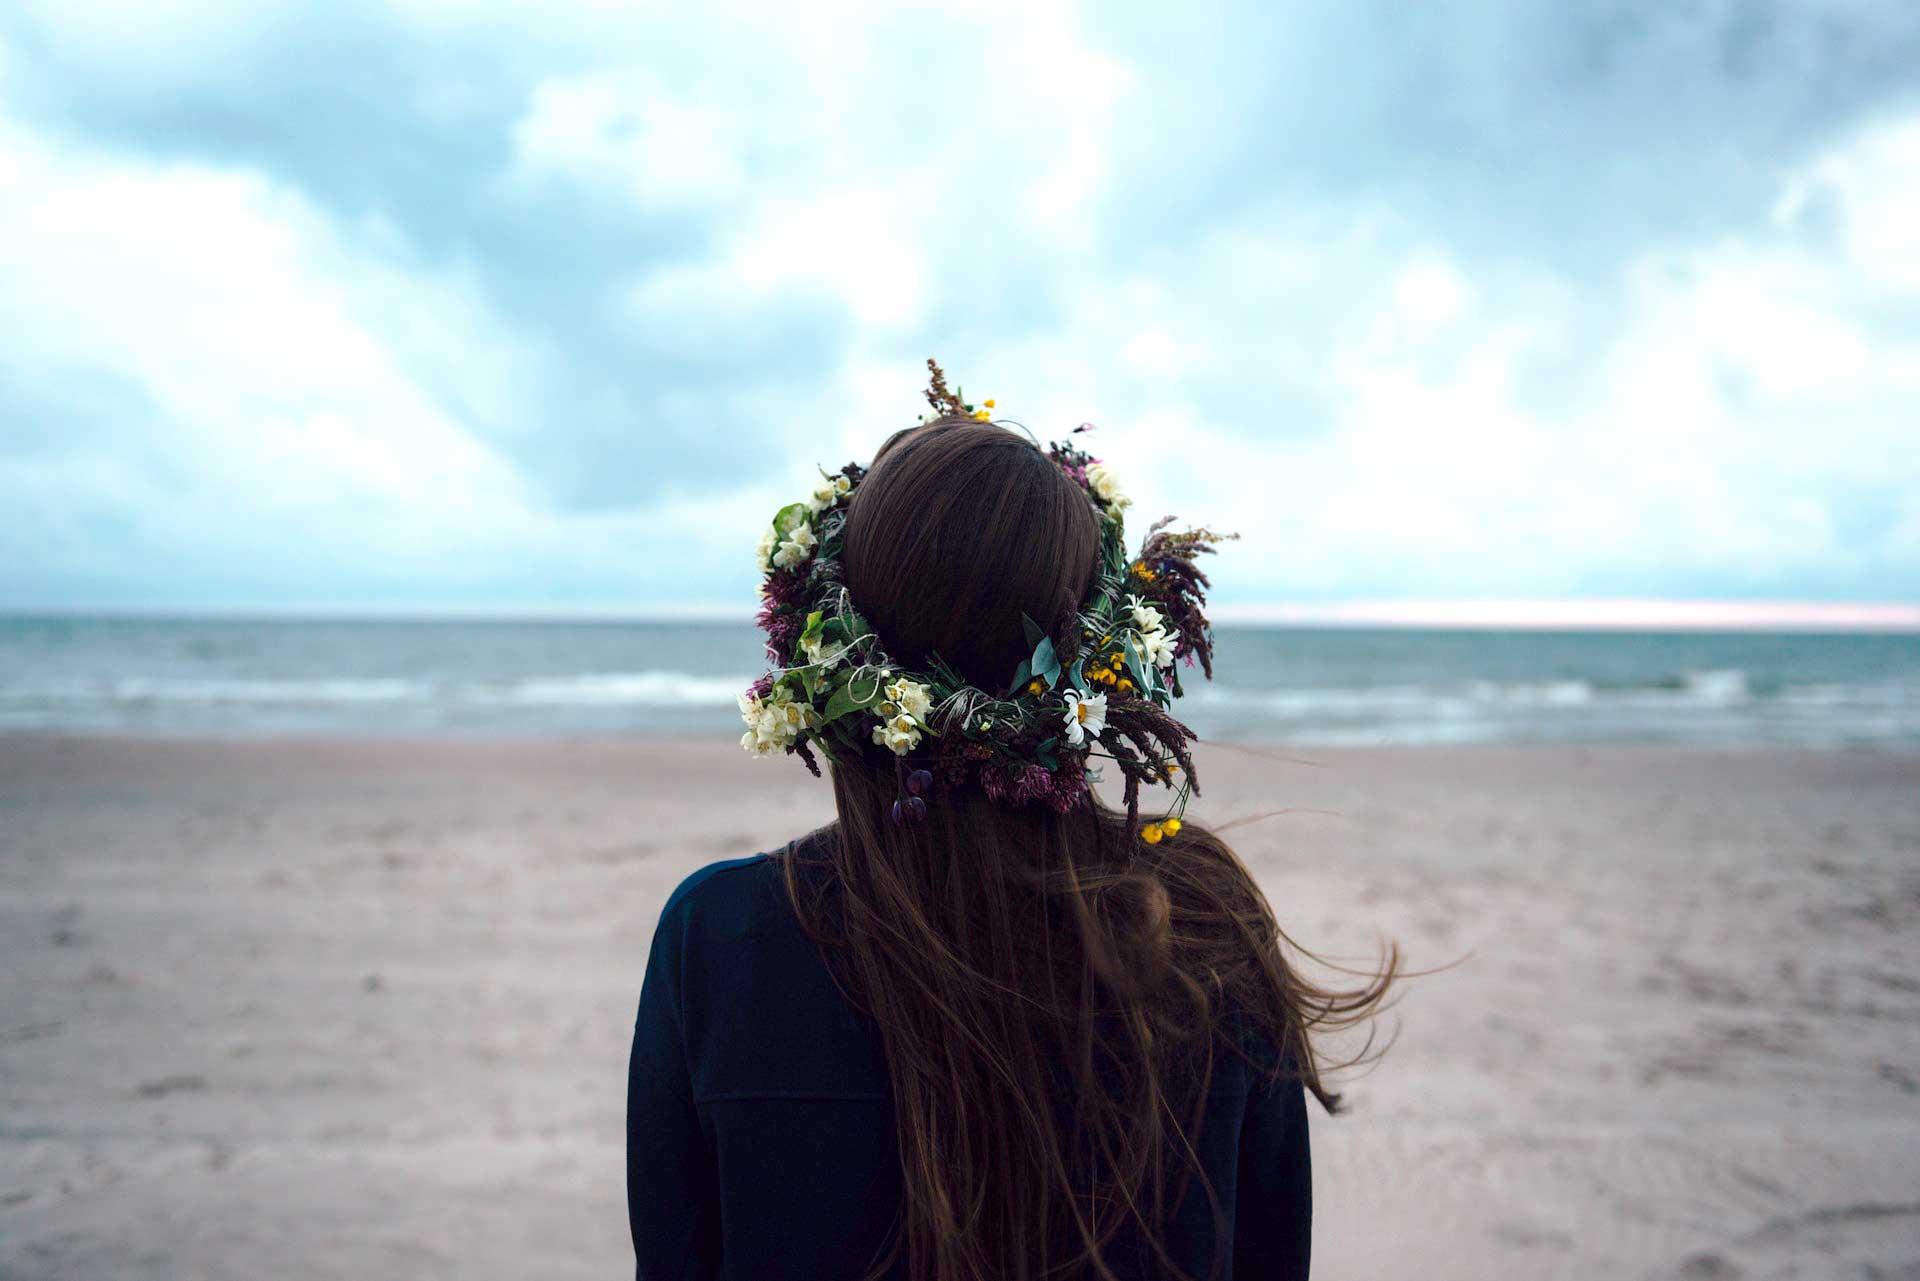 49+ Heart Touching HD Sad Girl Wallpaper for Broken Heart Alone Girl